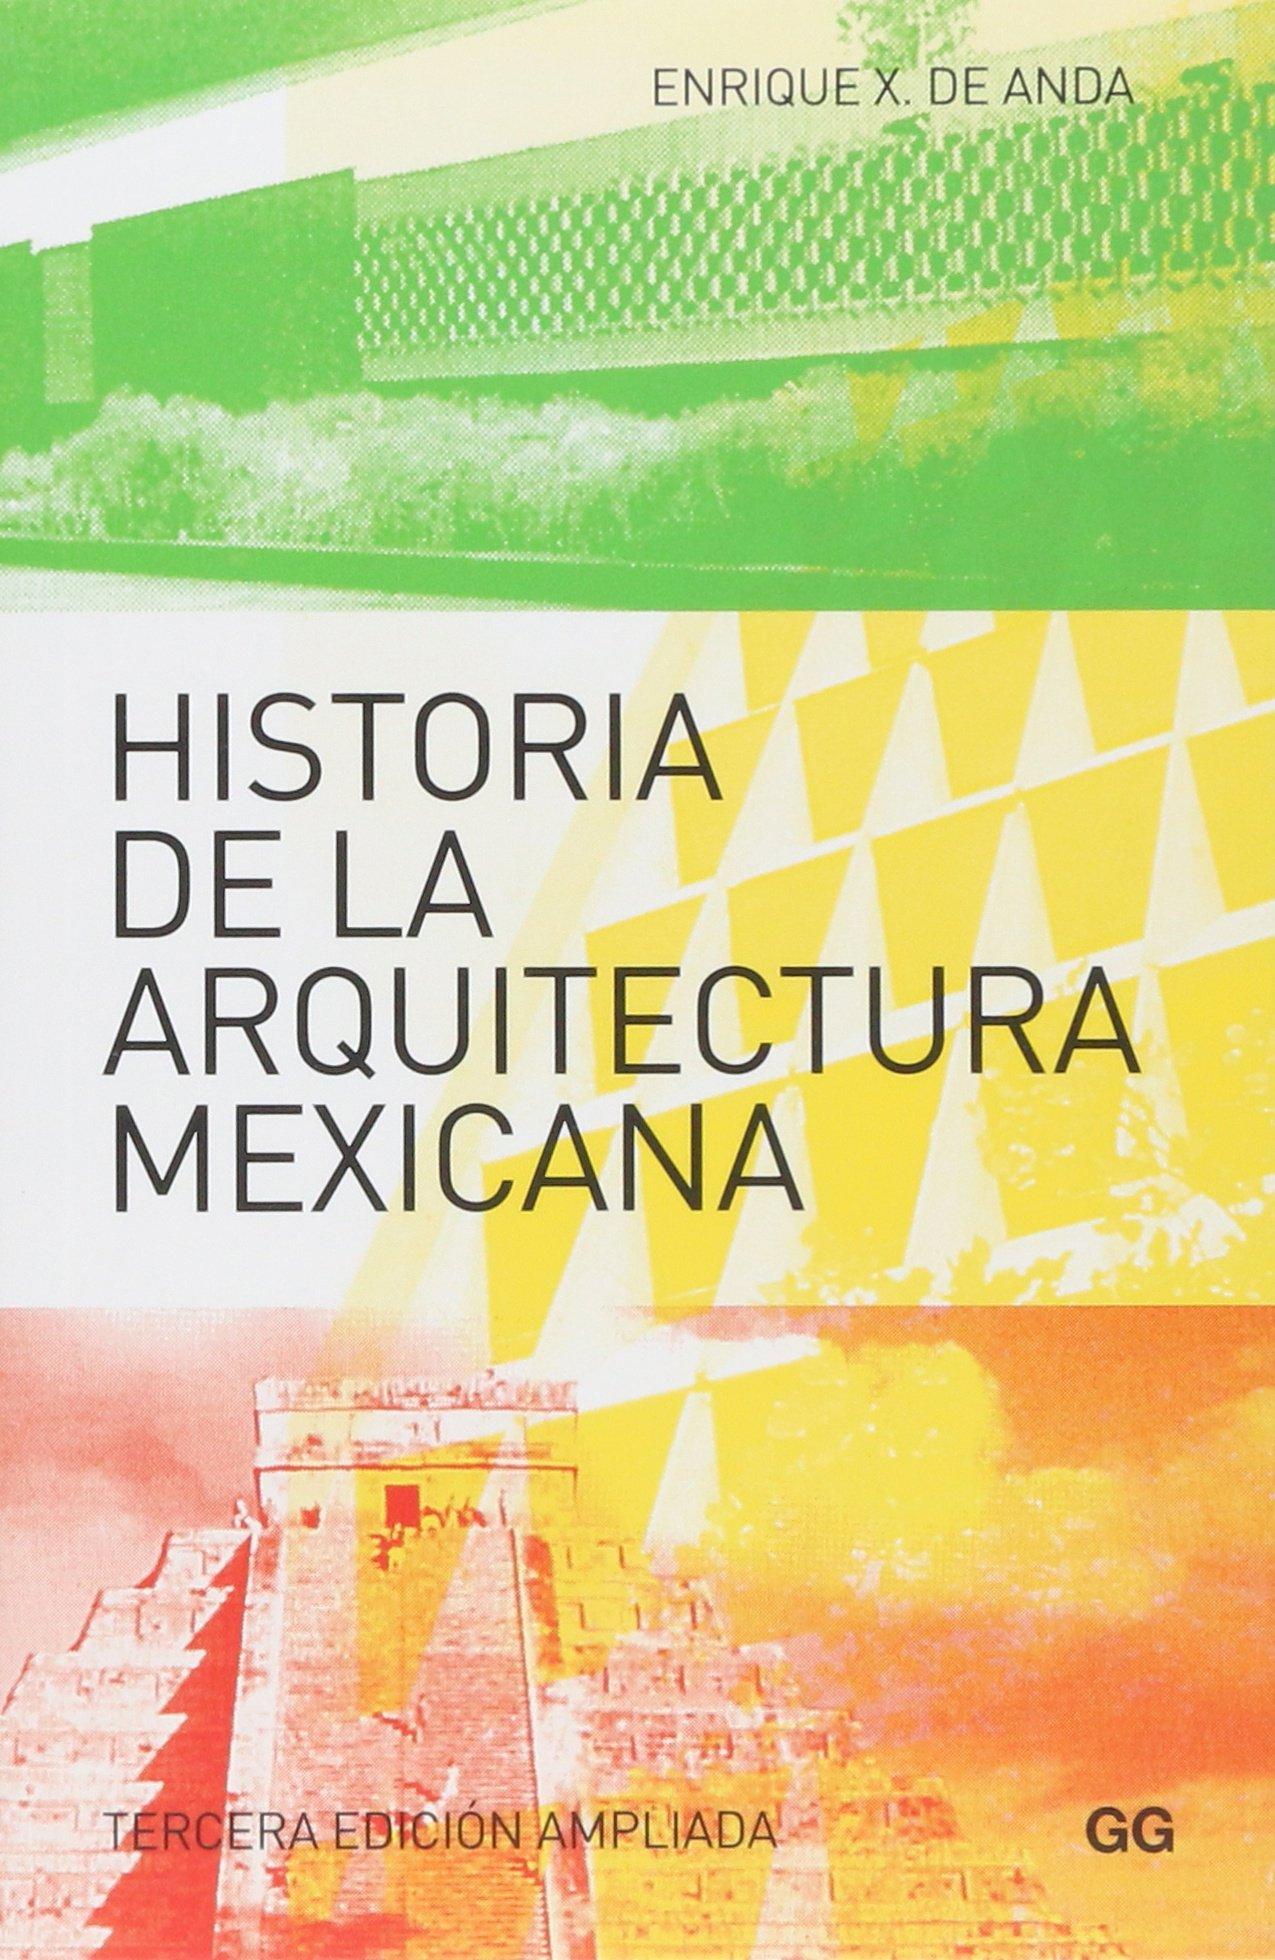 Libro: Historia de la Arquitectura Mexicana